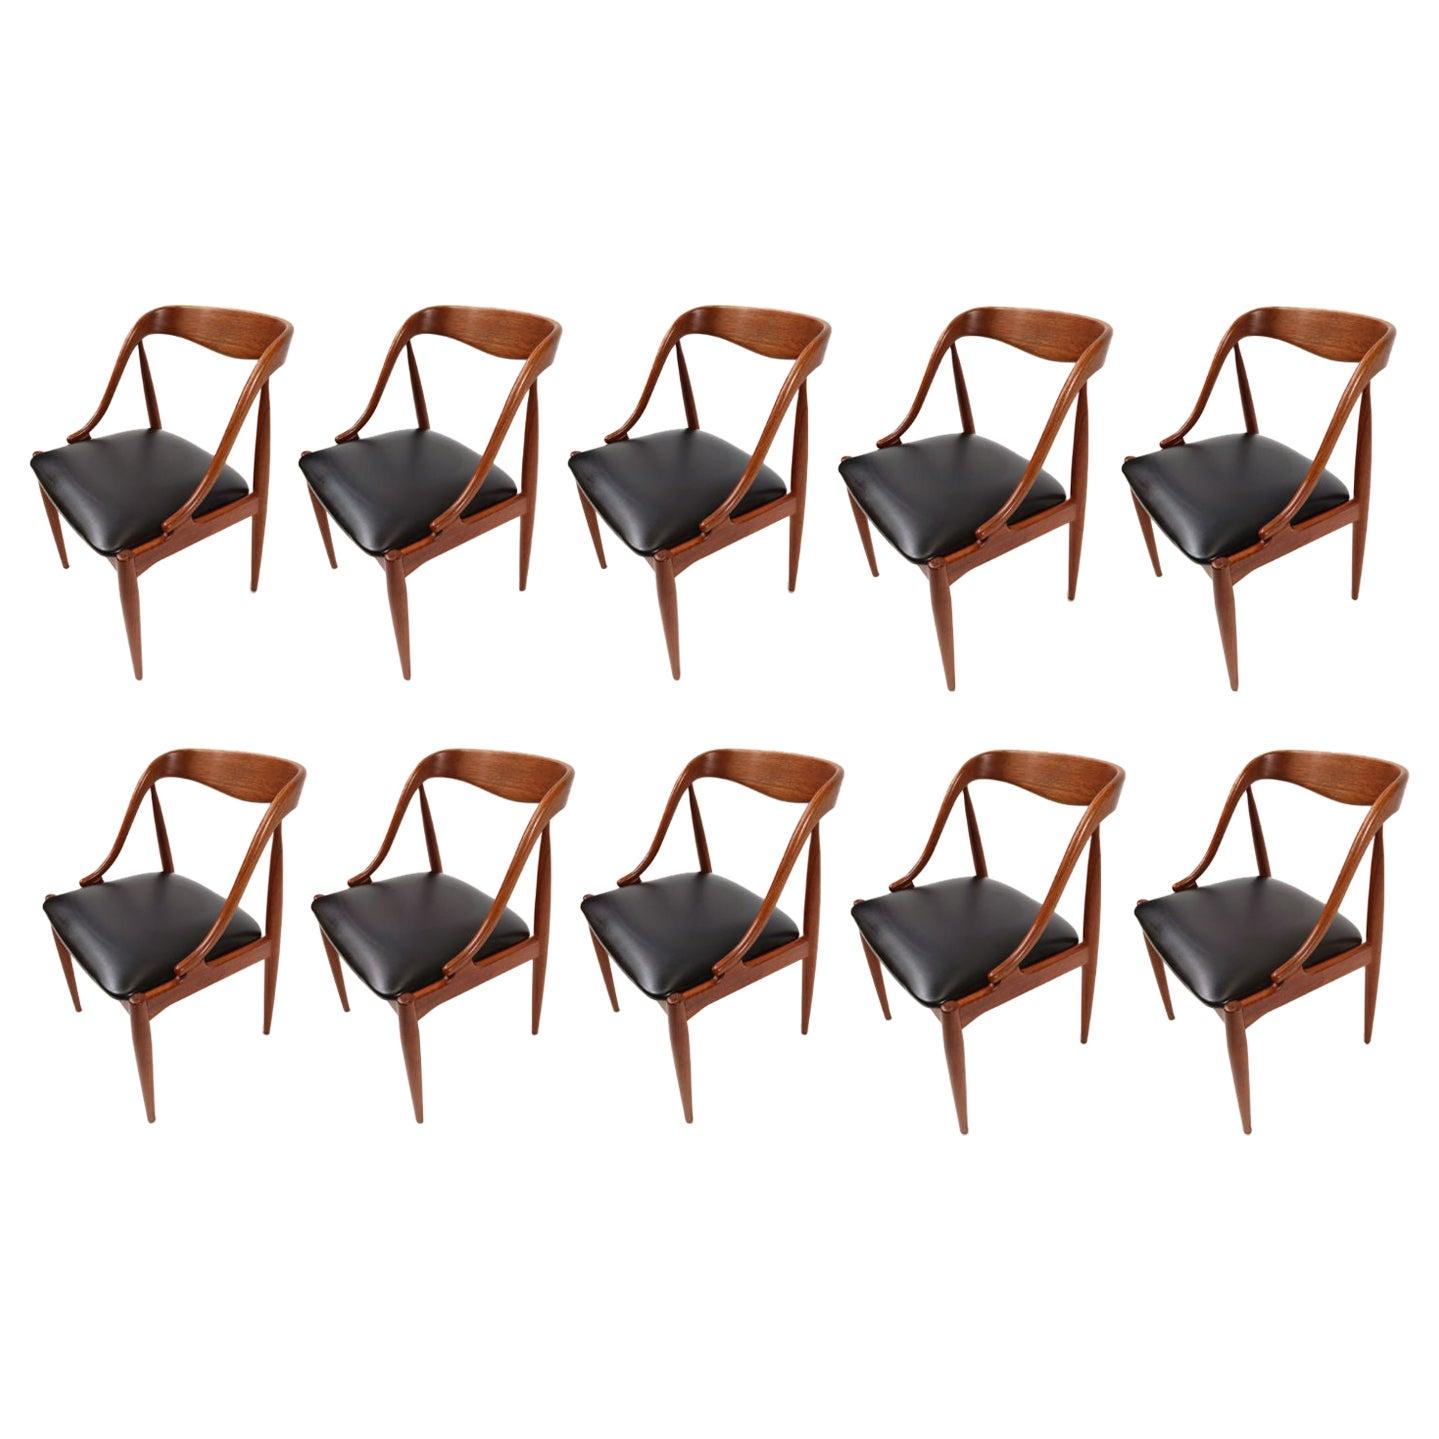 Set of 10 Johannes Andersen for Uldum Møbelfabrik Danish Teak Dining Chairs